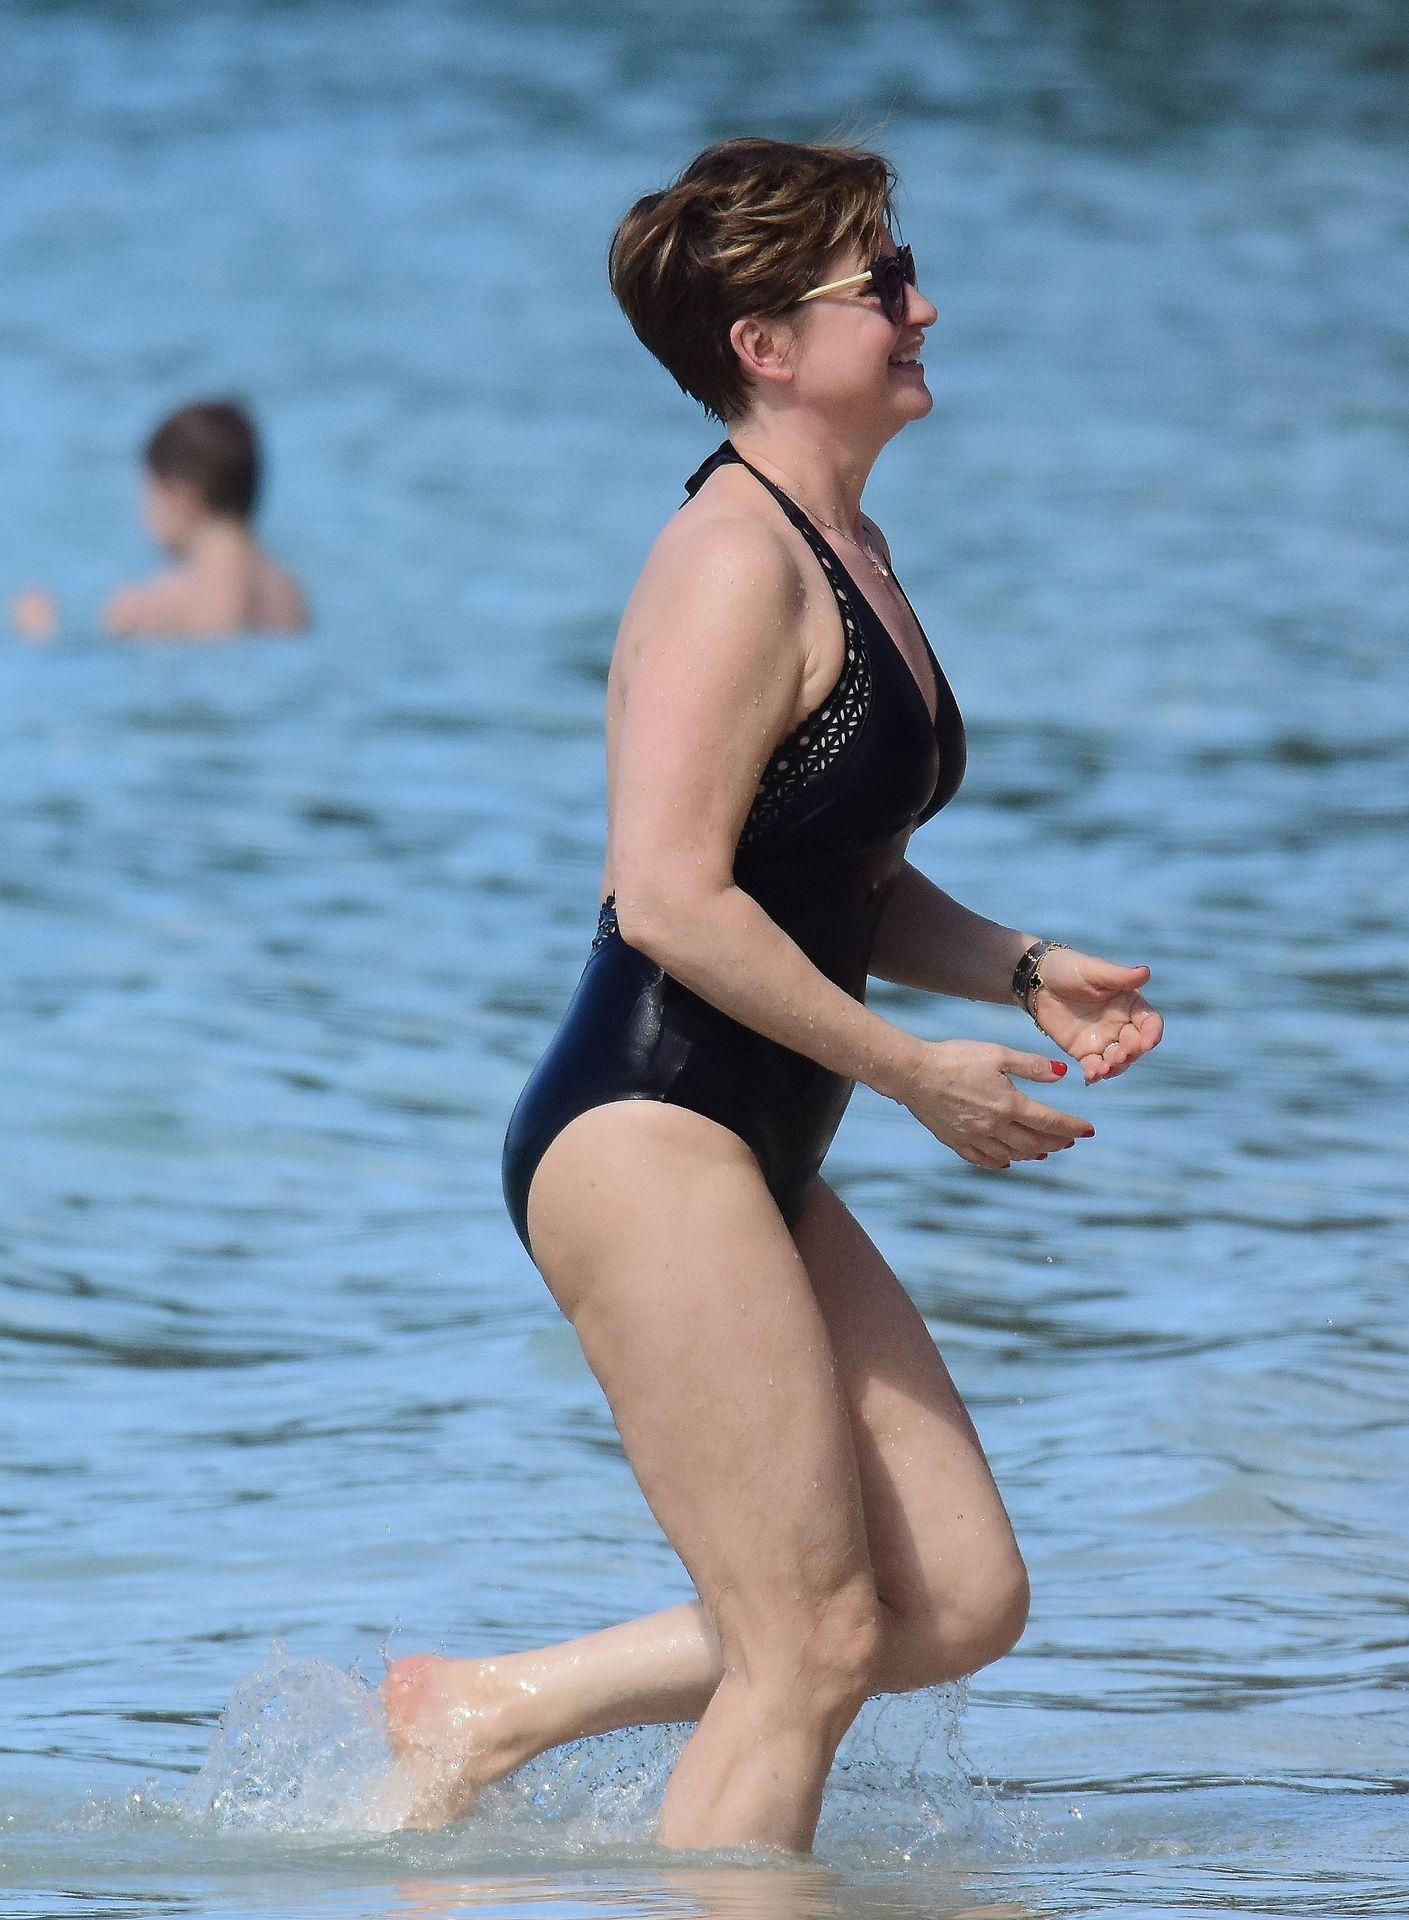 Emma Forbes Hot (70 Photos) 55